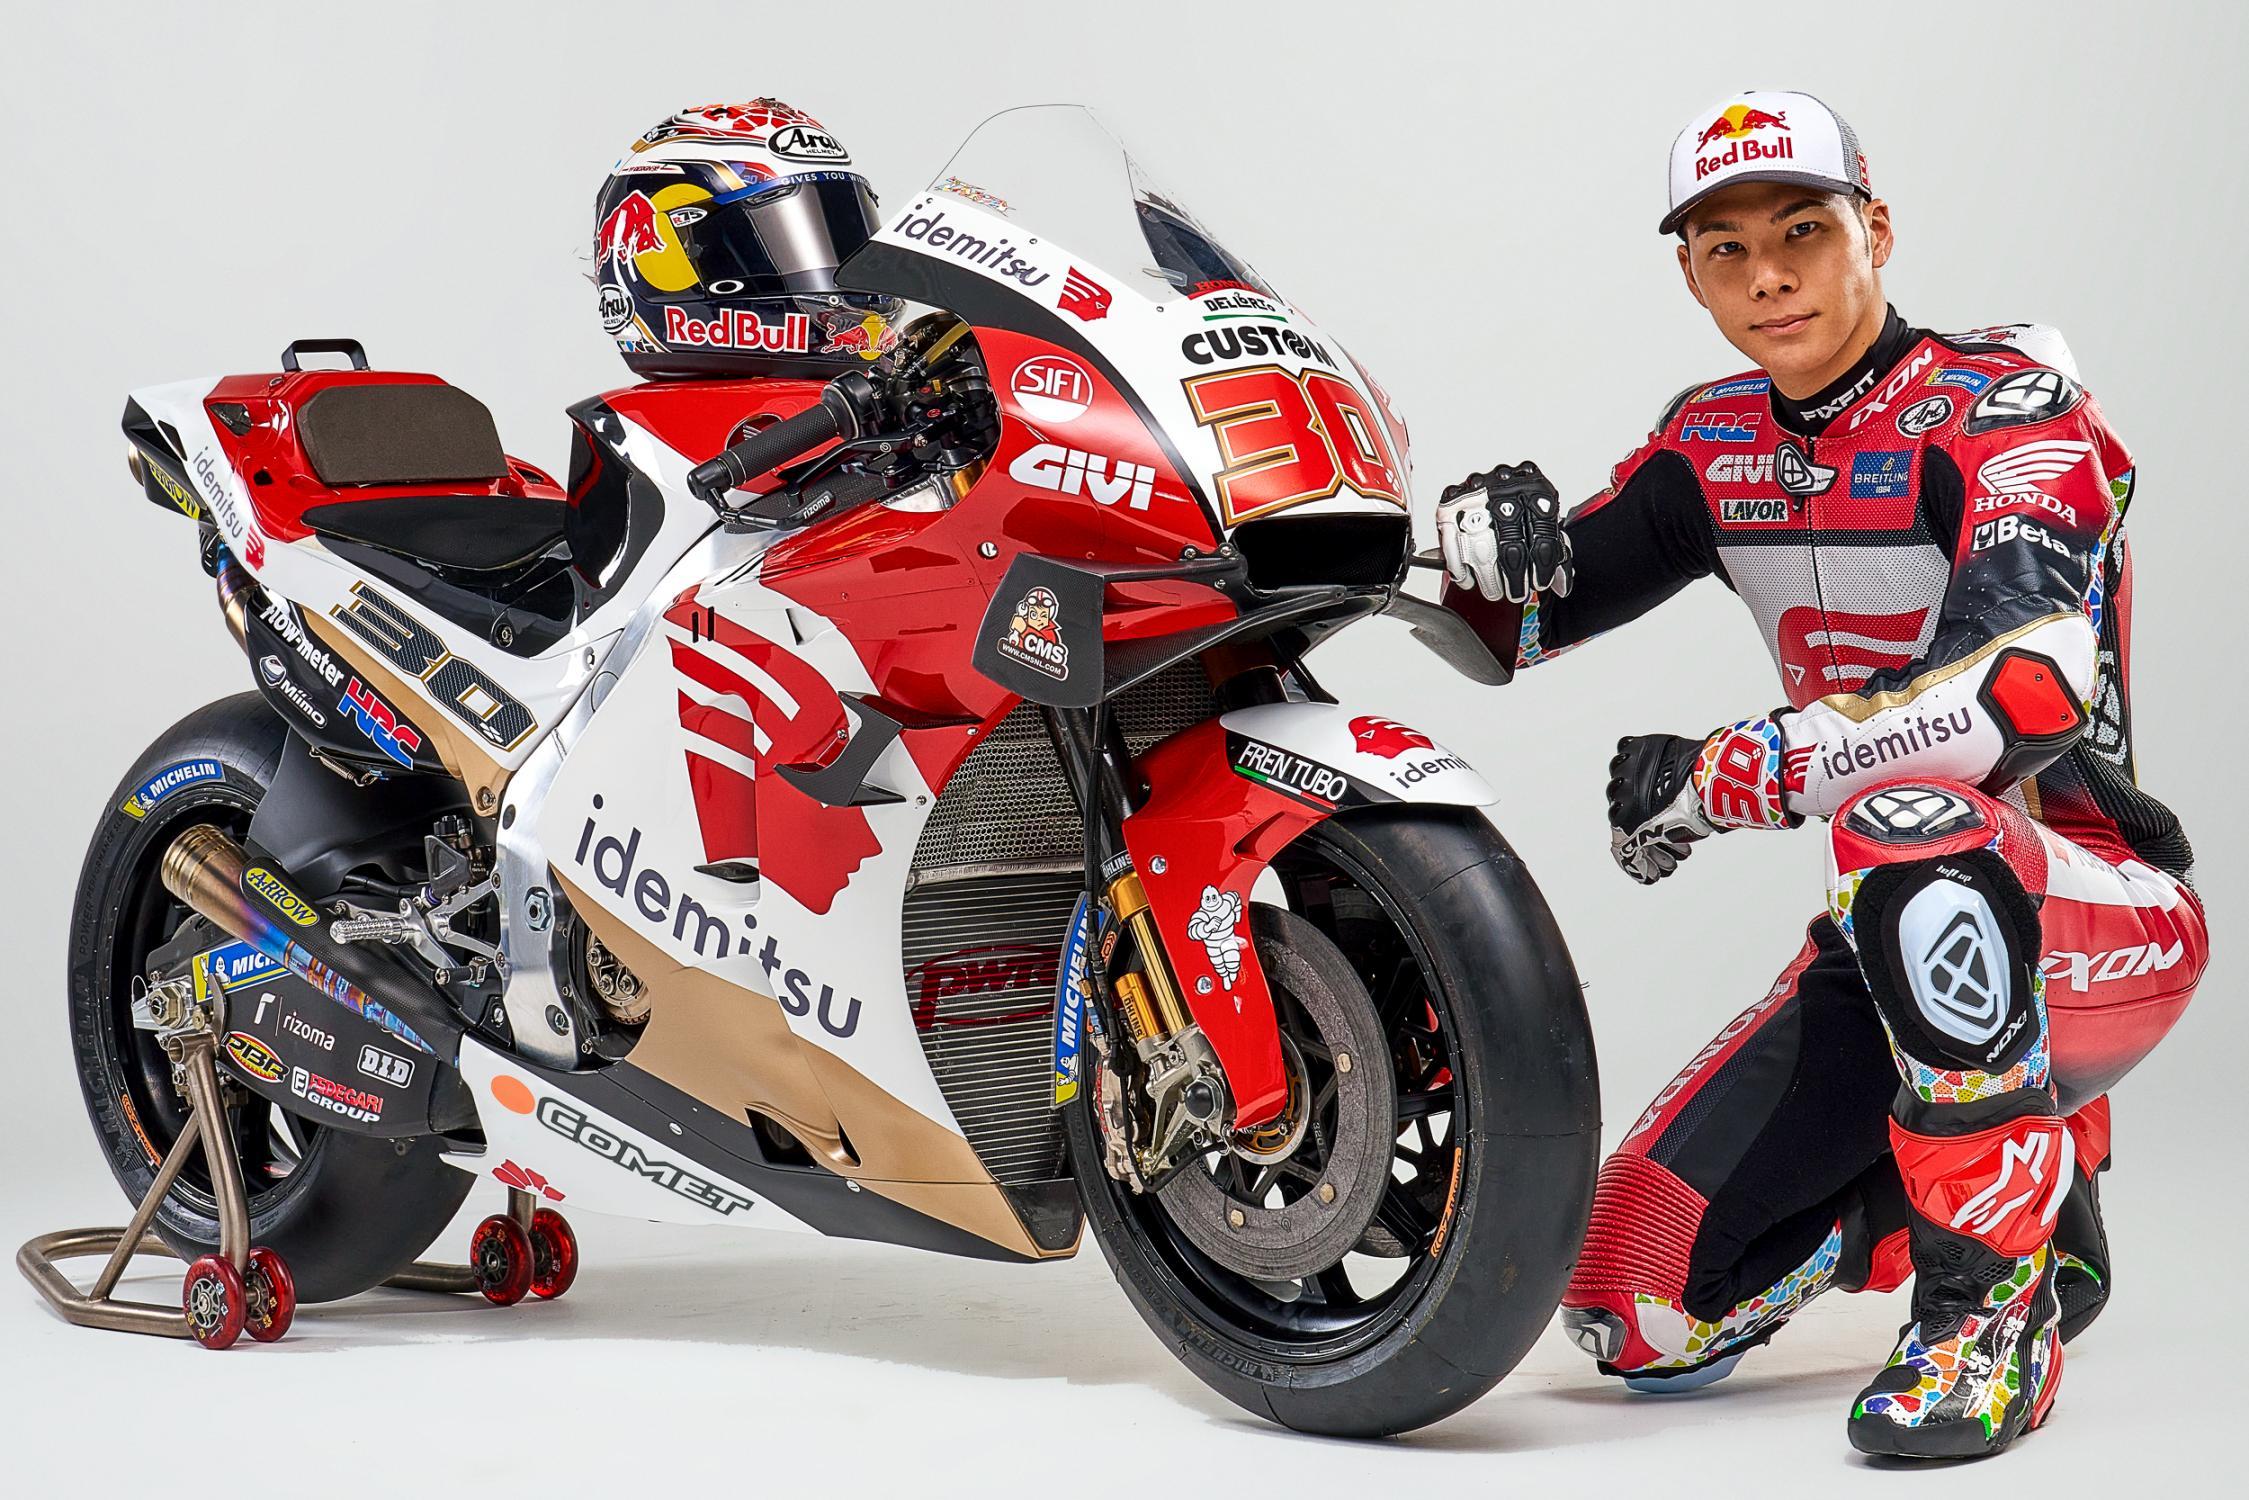 Takaaki Nakagami, LCR Honda, MotoGP, 2021